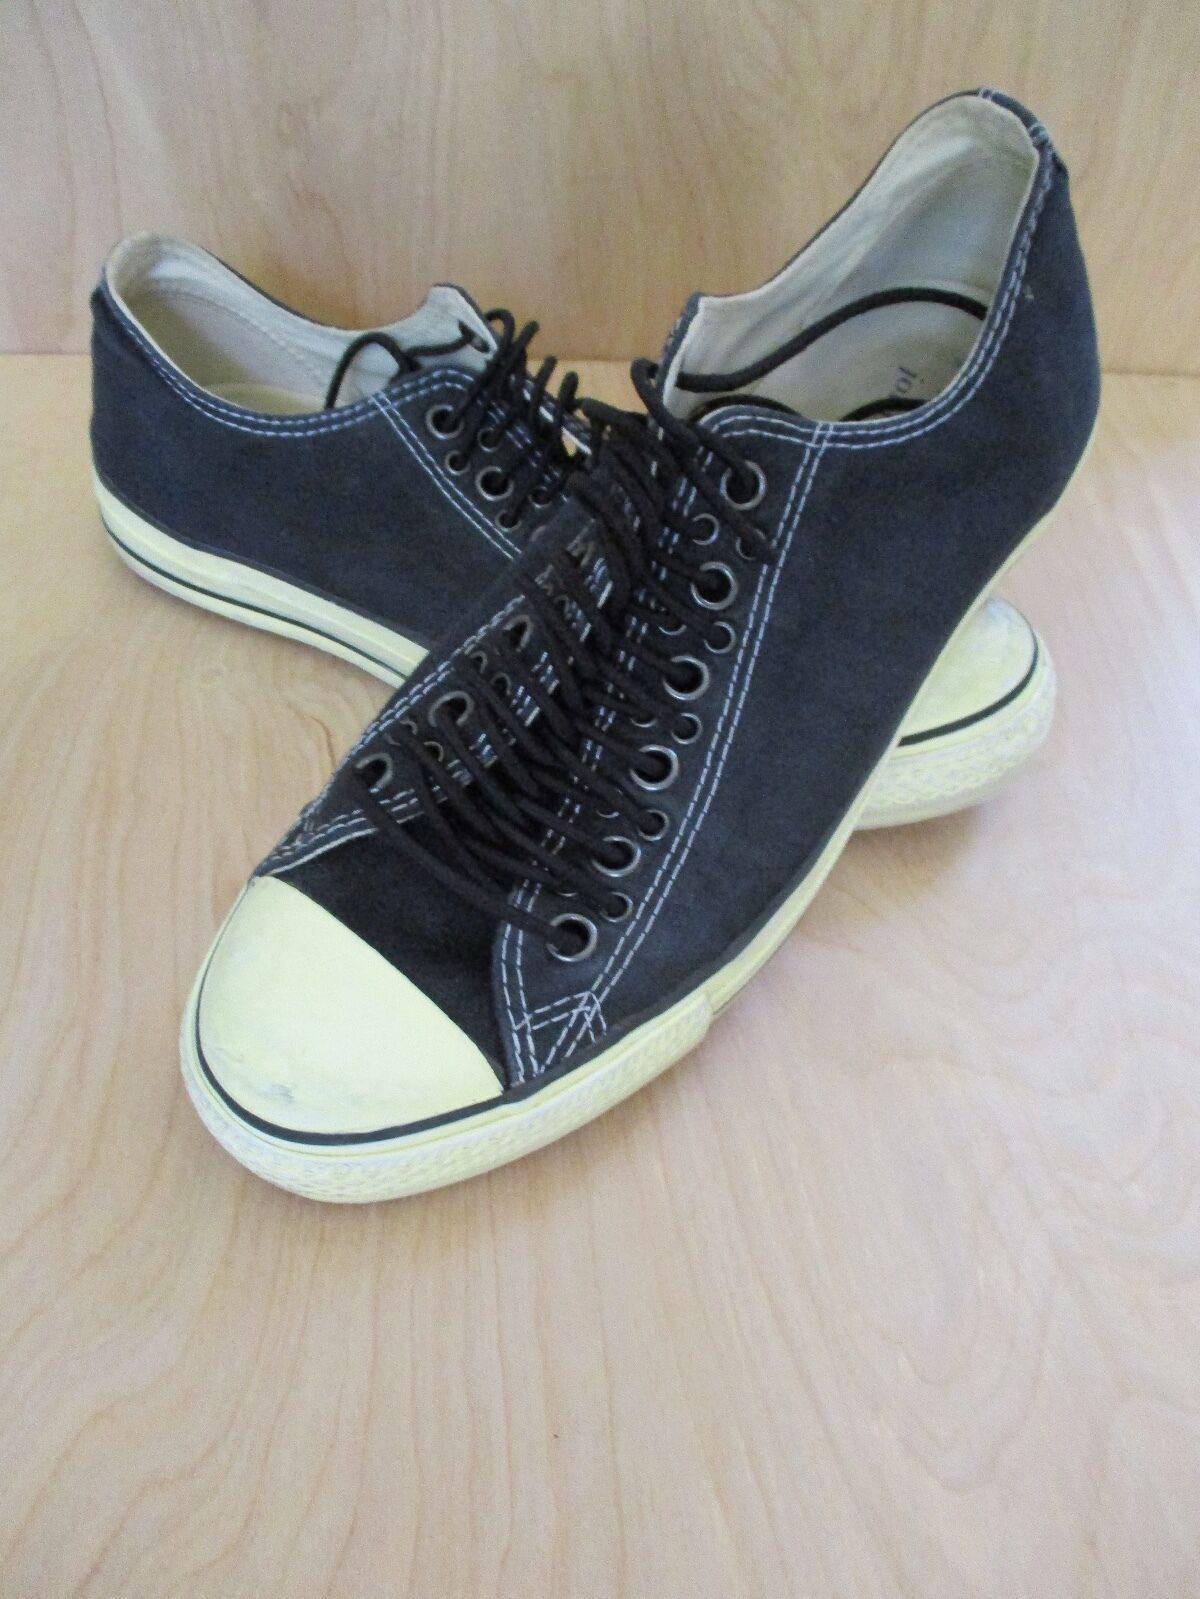 JOHN VARVATOS Converse black low multi hole sneakers trainers 8